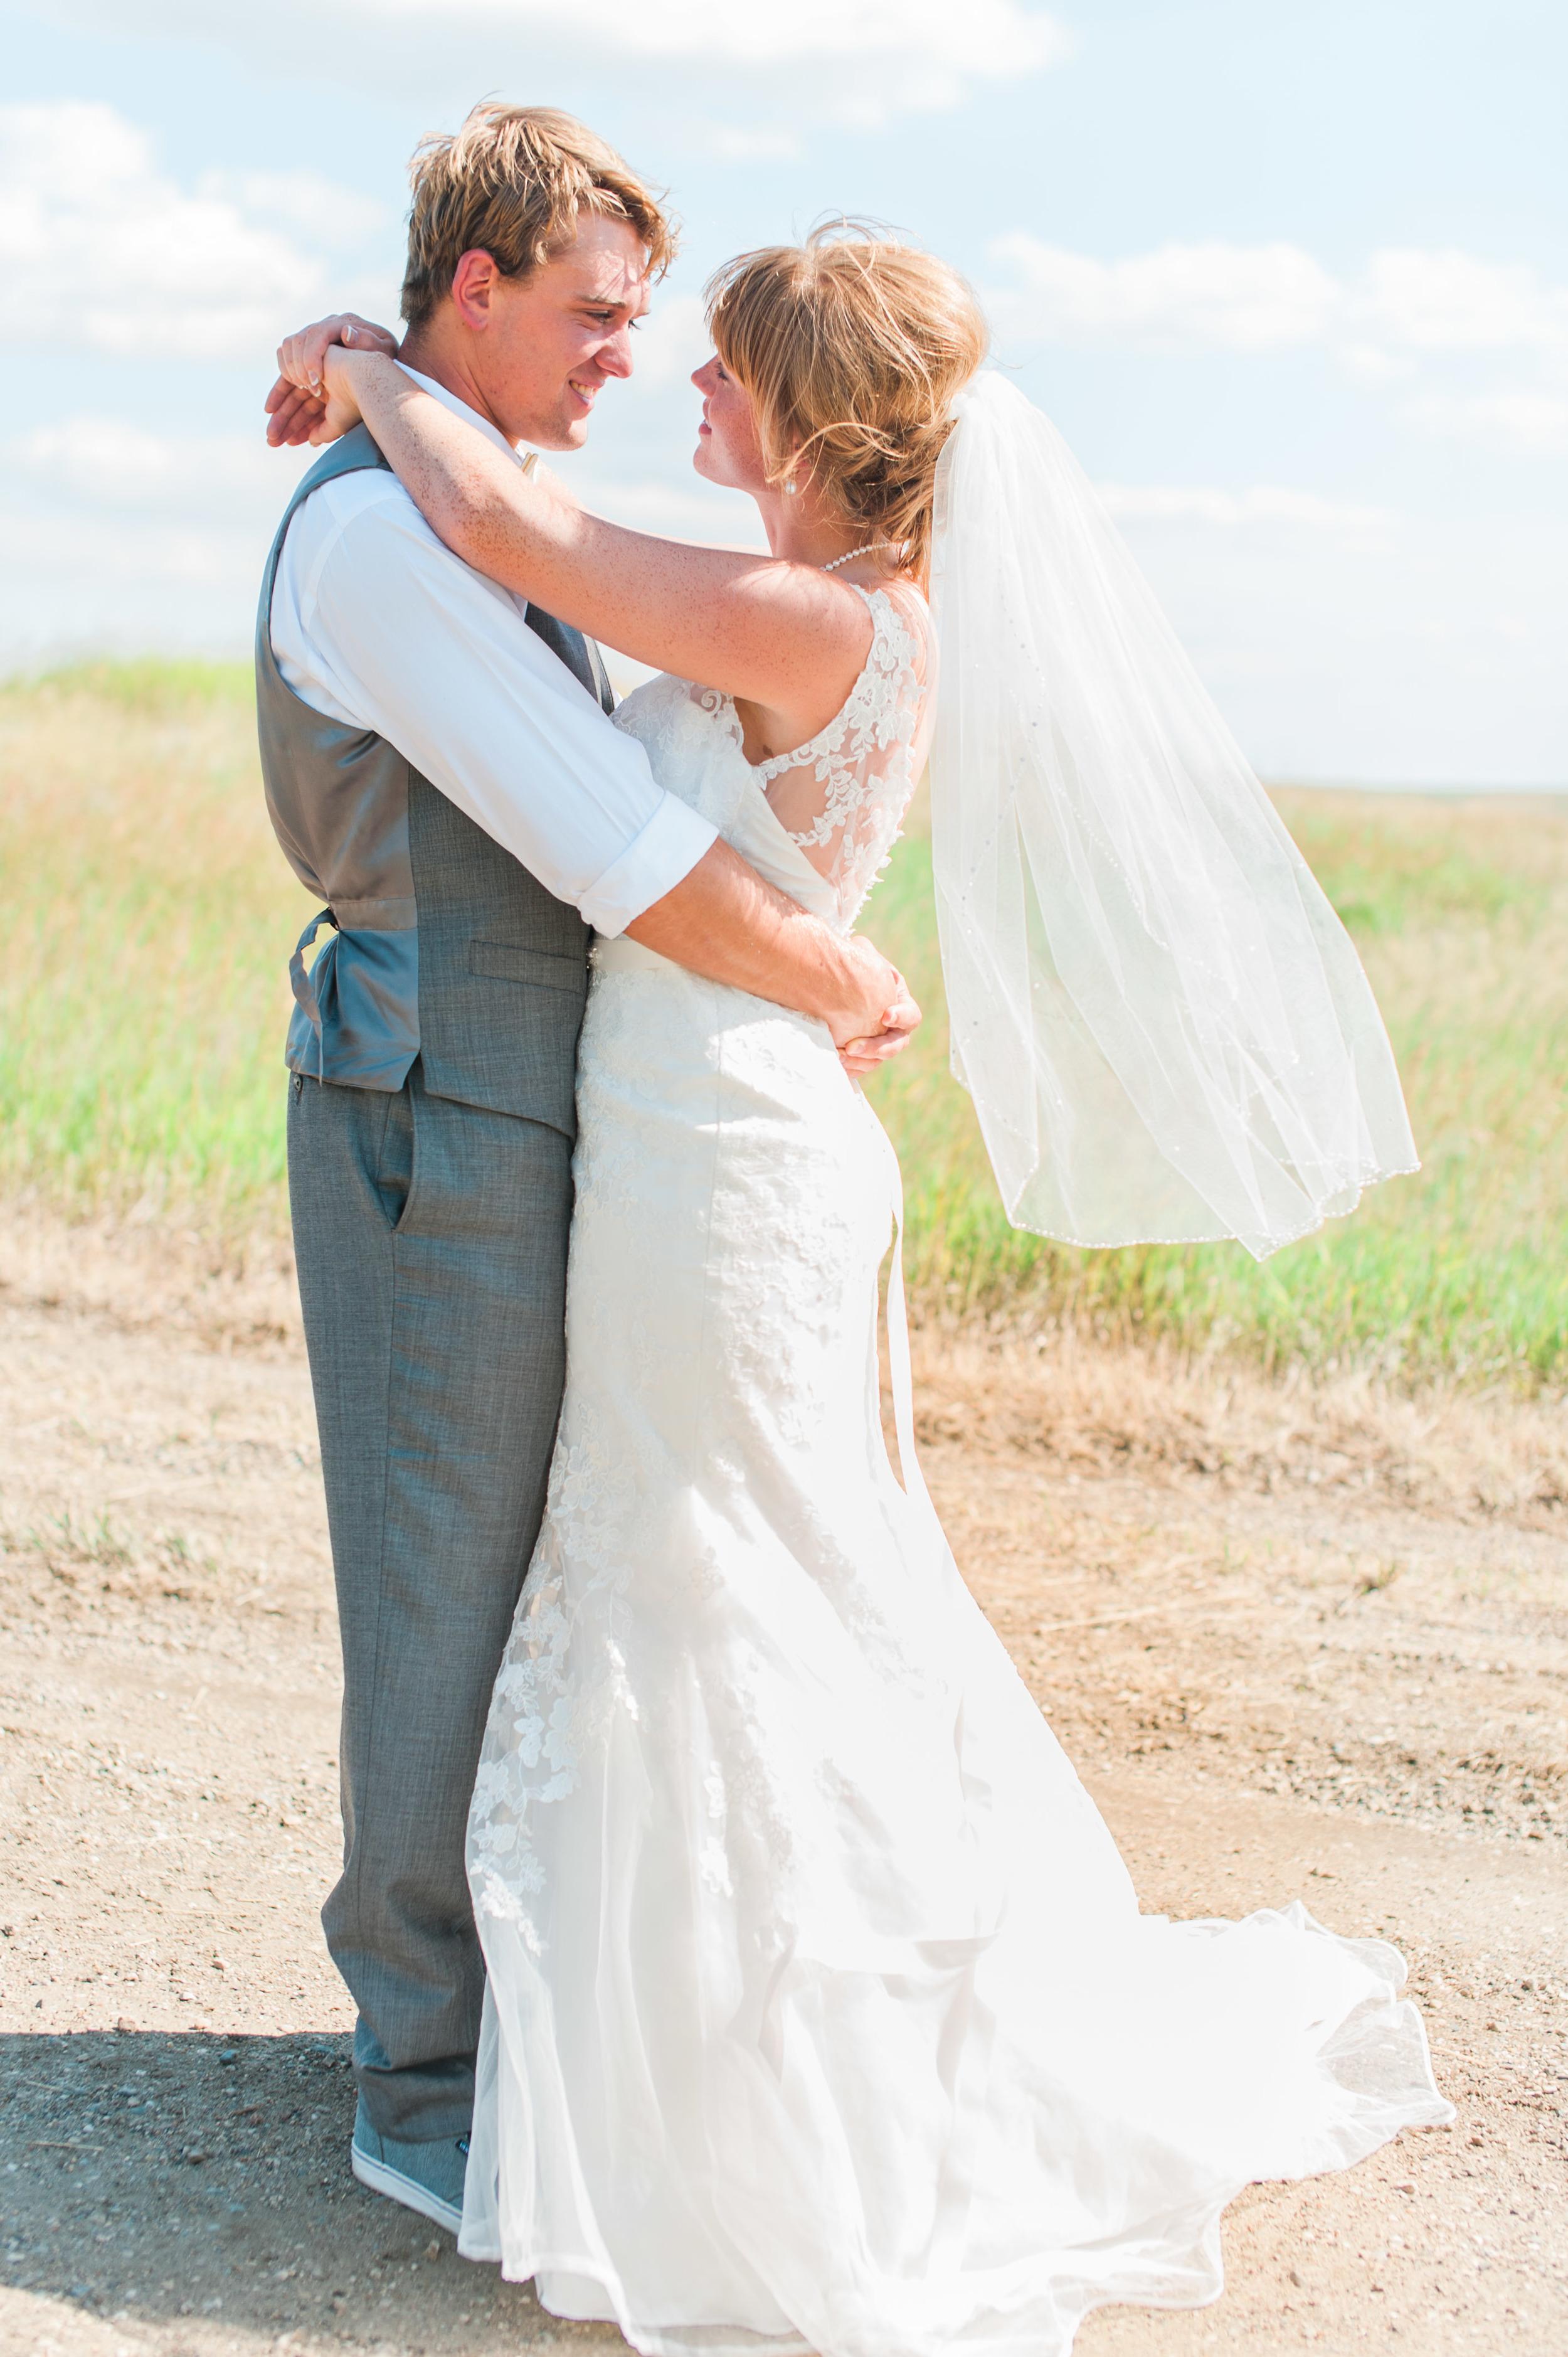 wedding-photography-17.jpg